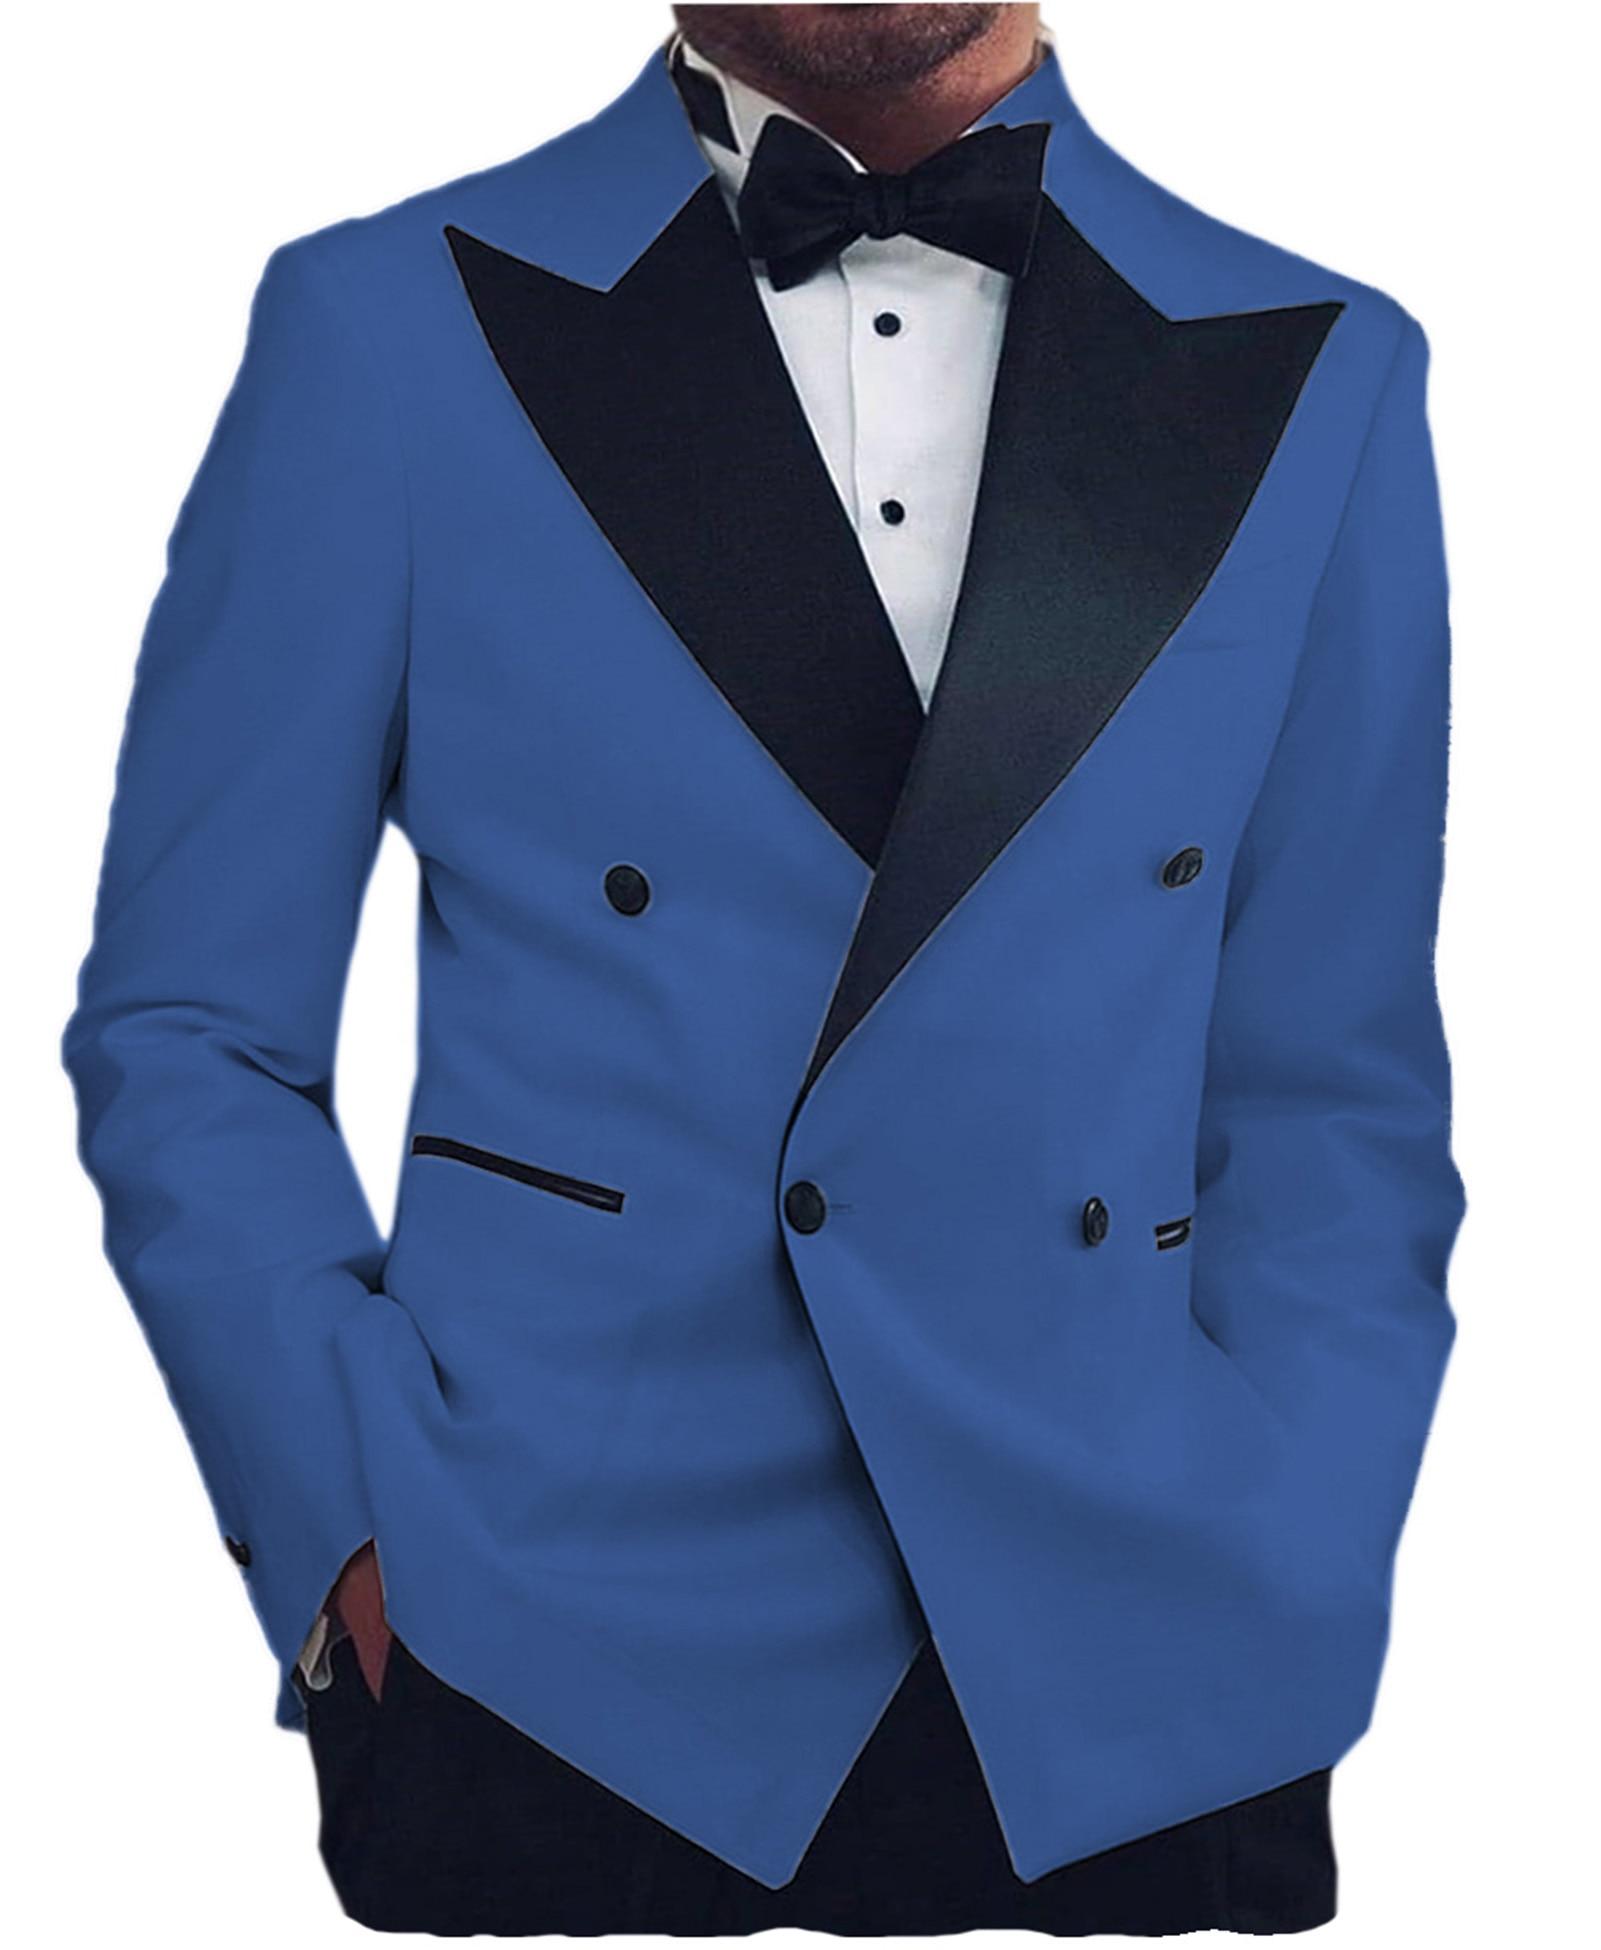 Solovedress بدلة رجالي 2 قطعة عادية الذروة التلبيب شقة الصلبة مزدوجة الصدر البدلات الرسمية سترة بنطلون لحفل الزفاف (السترة + السراويل)